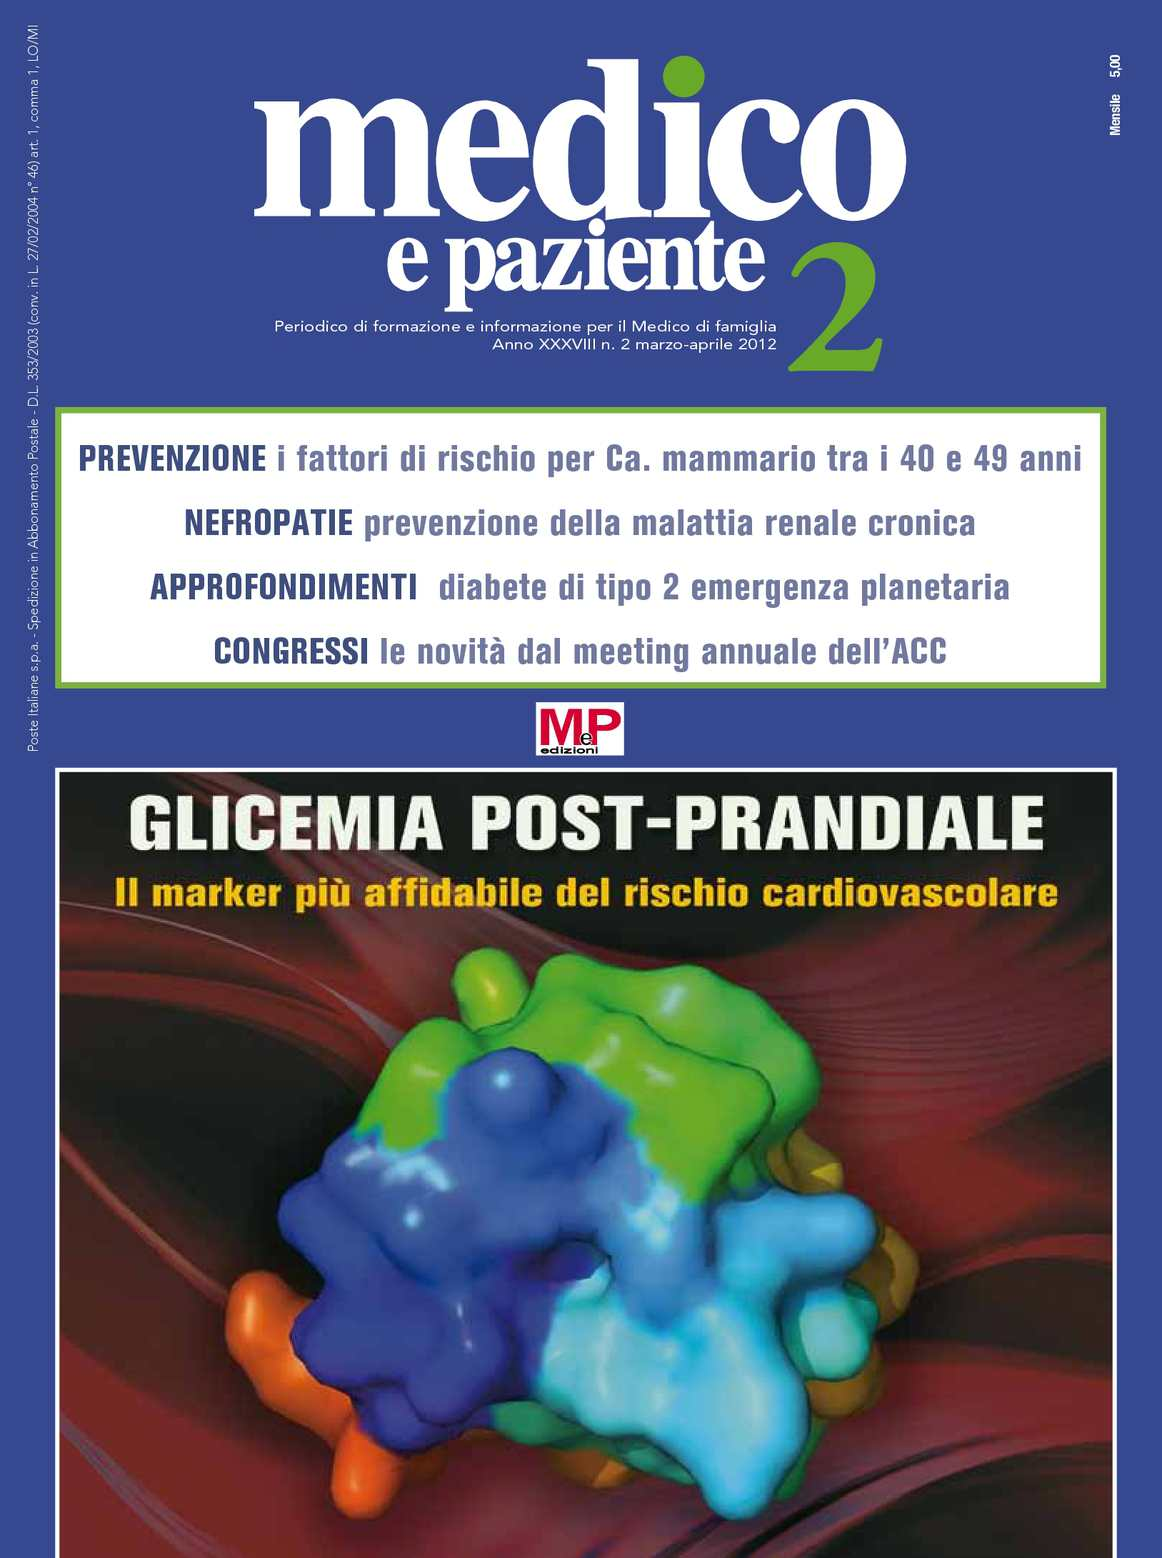 meglio ciprofloxacina o levofloxacina per la prostatite cronica 2